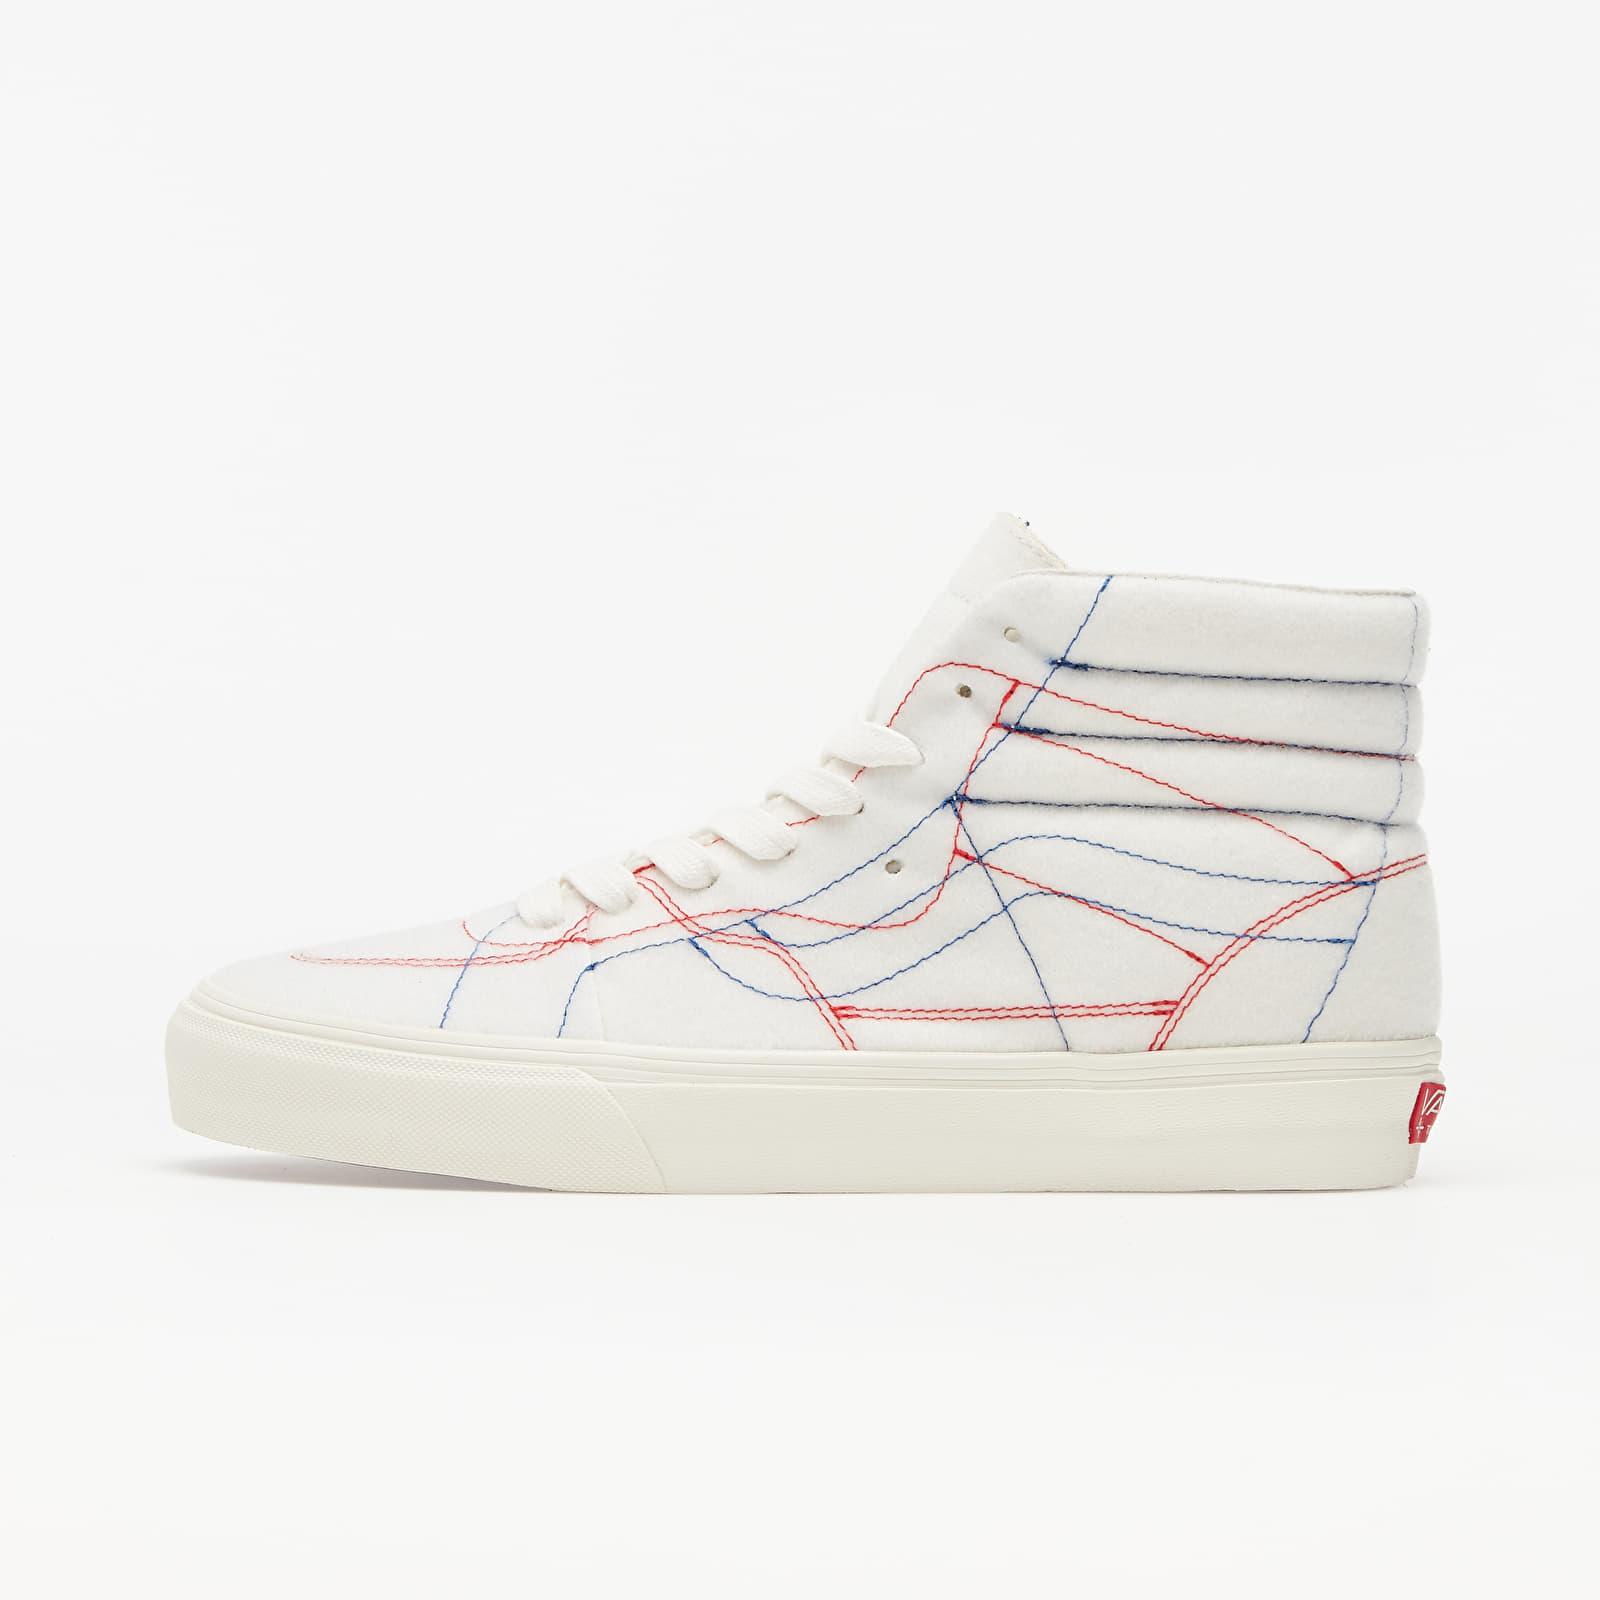 Men's shoes Vans x Taka Hayashi Diy Hi VLT LX (H&L) Marshmallow/ Multi